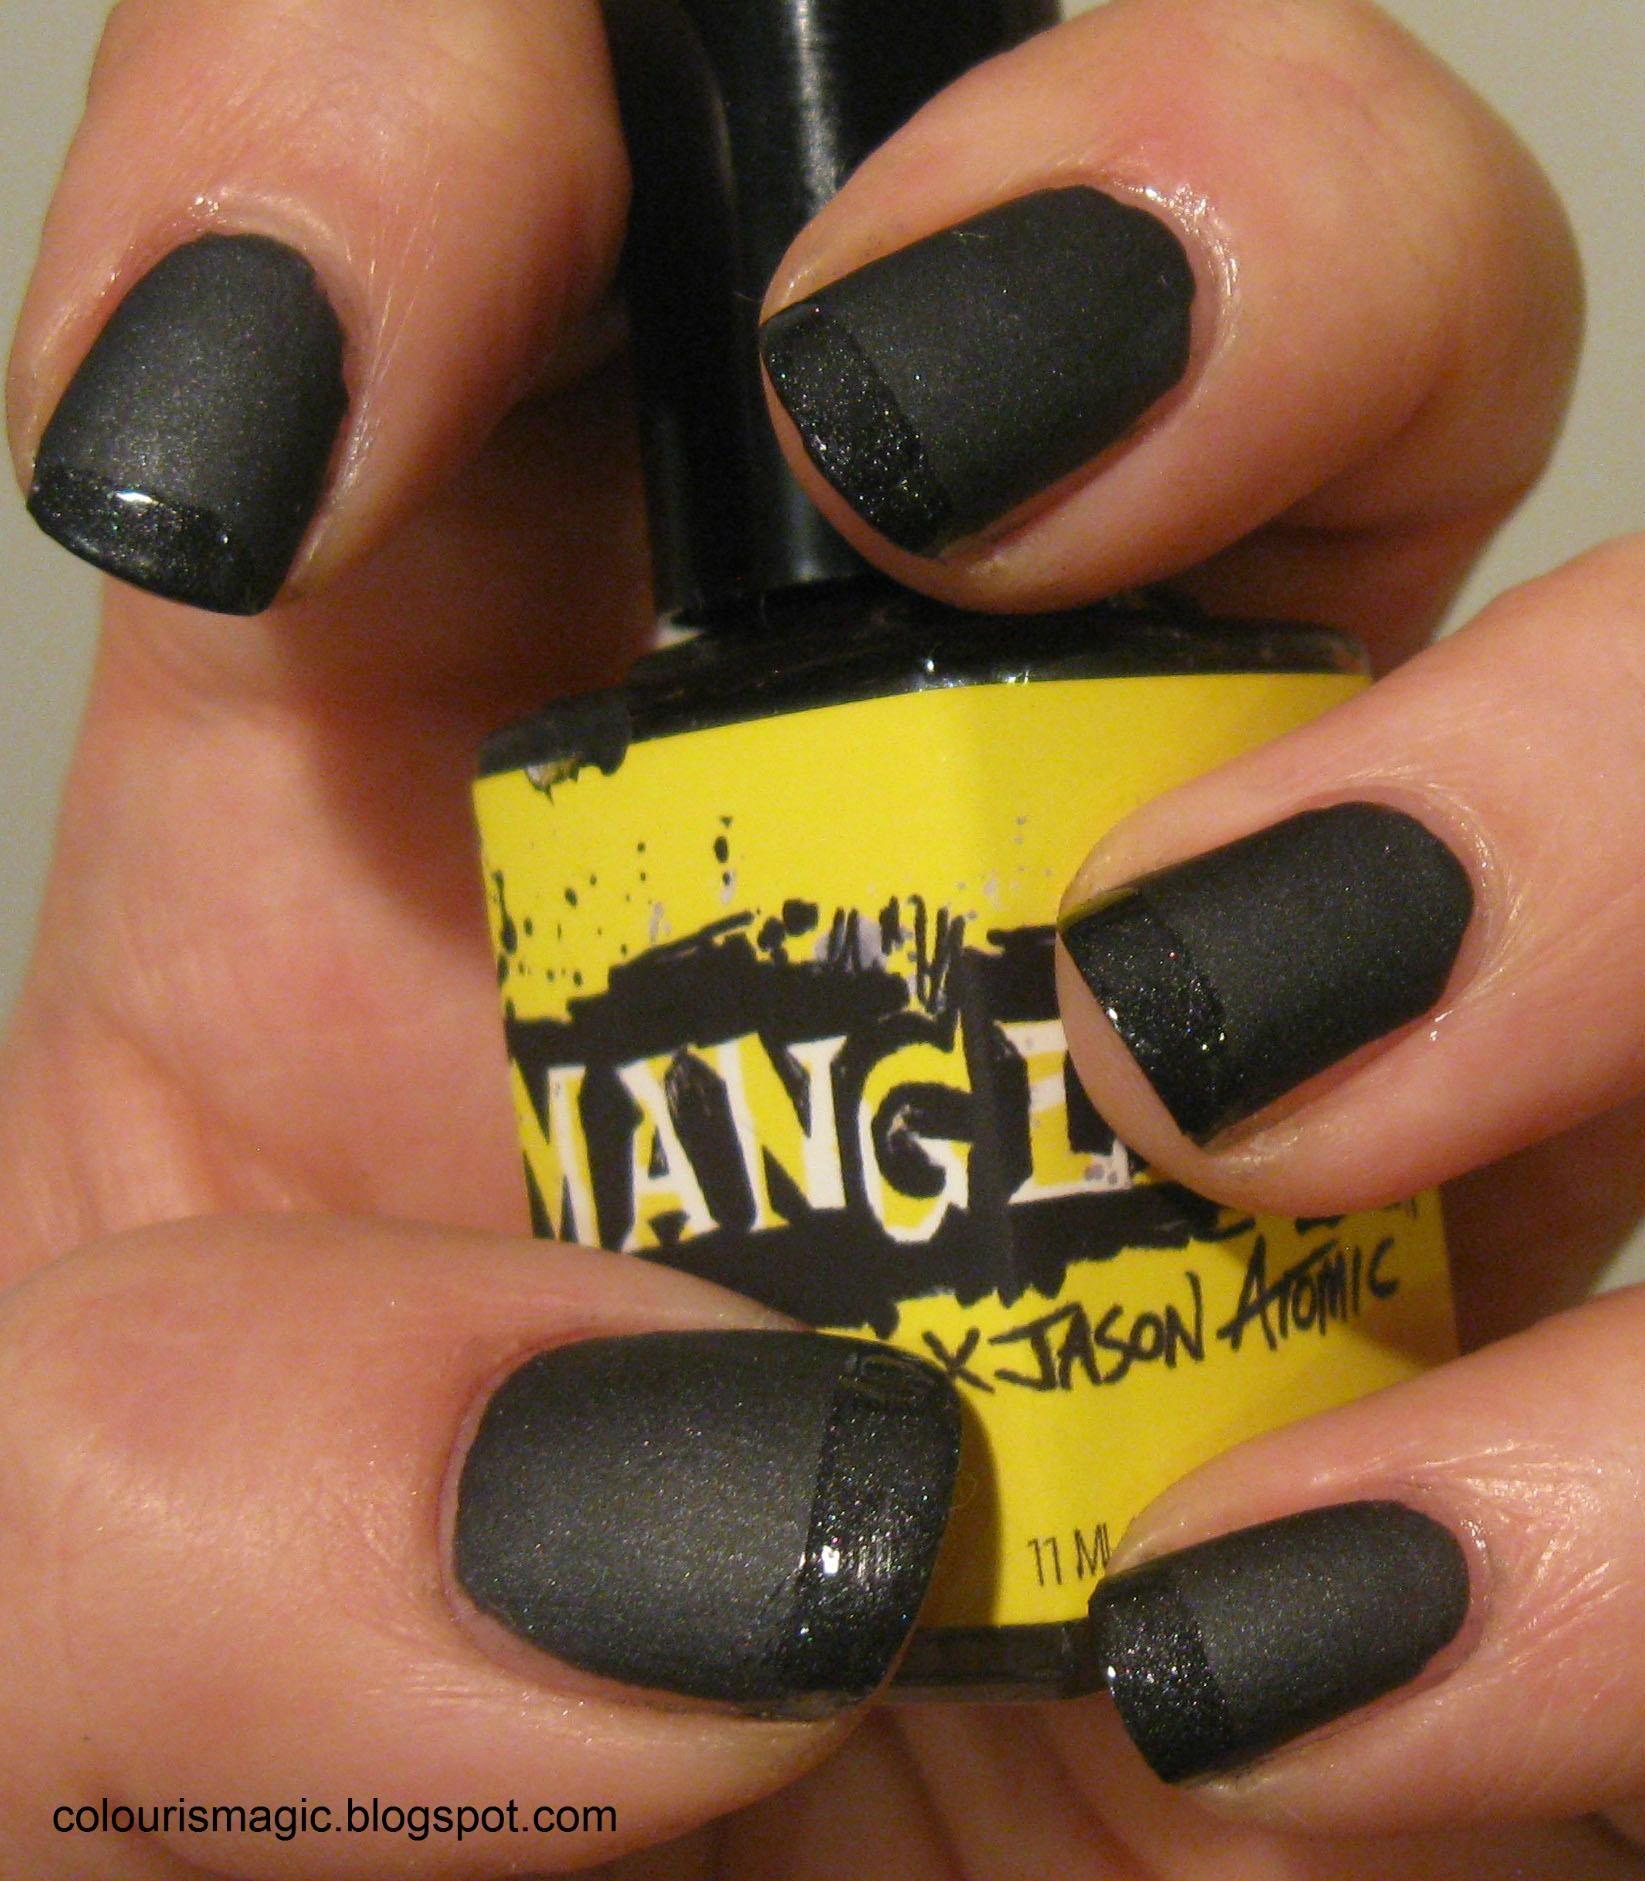 ManGlaze #Matte is Murder | Manicure, Manicure nail designs and ...